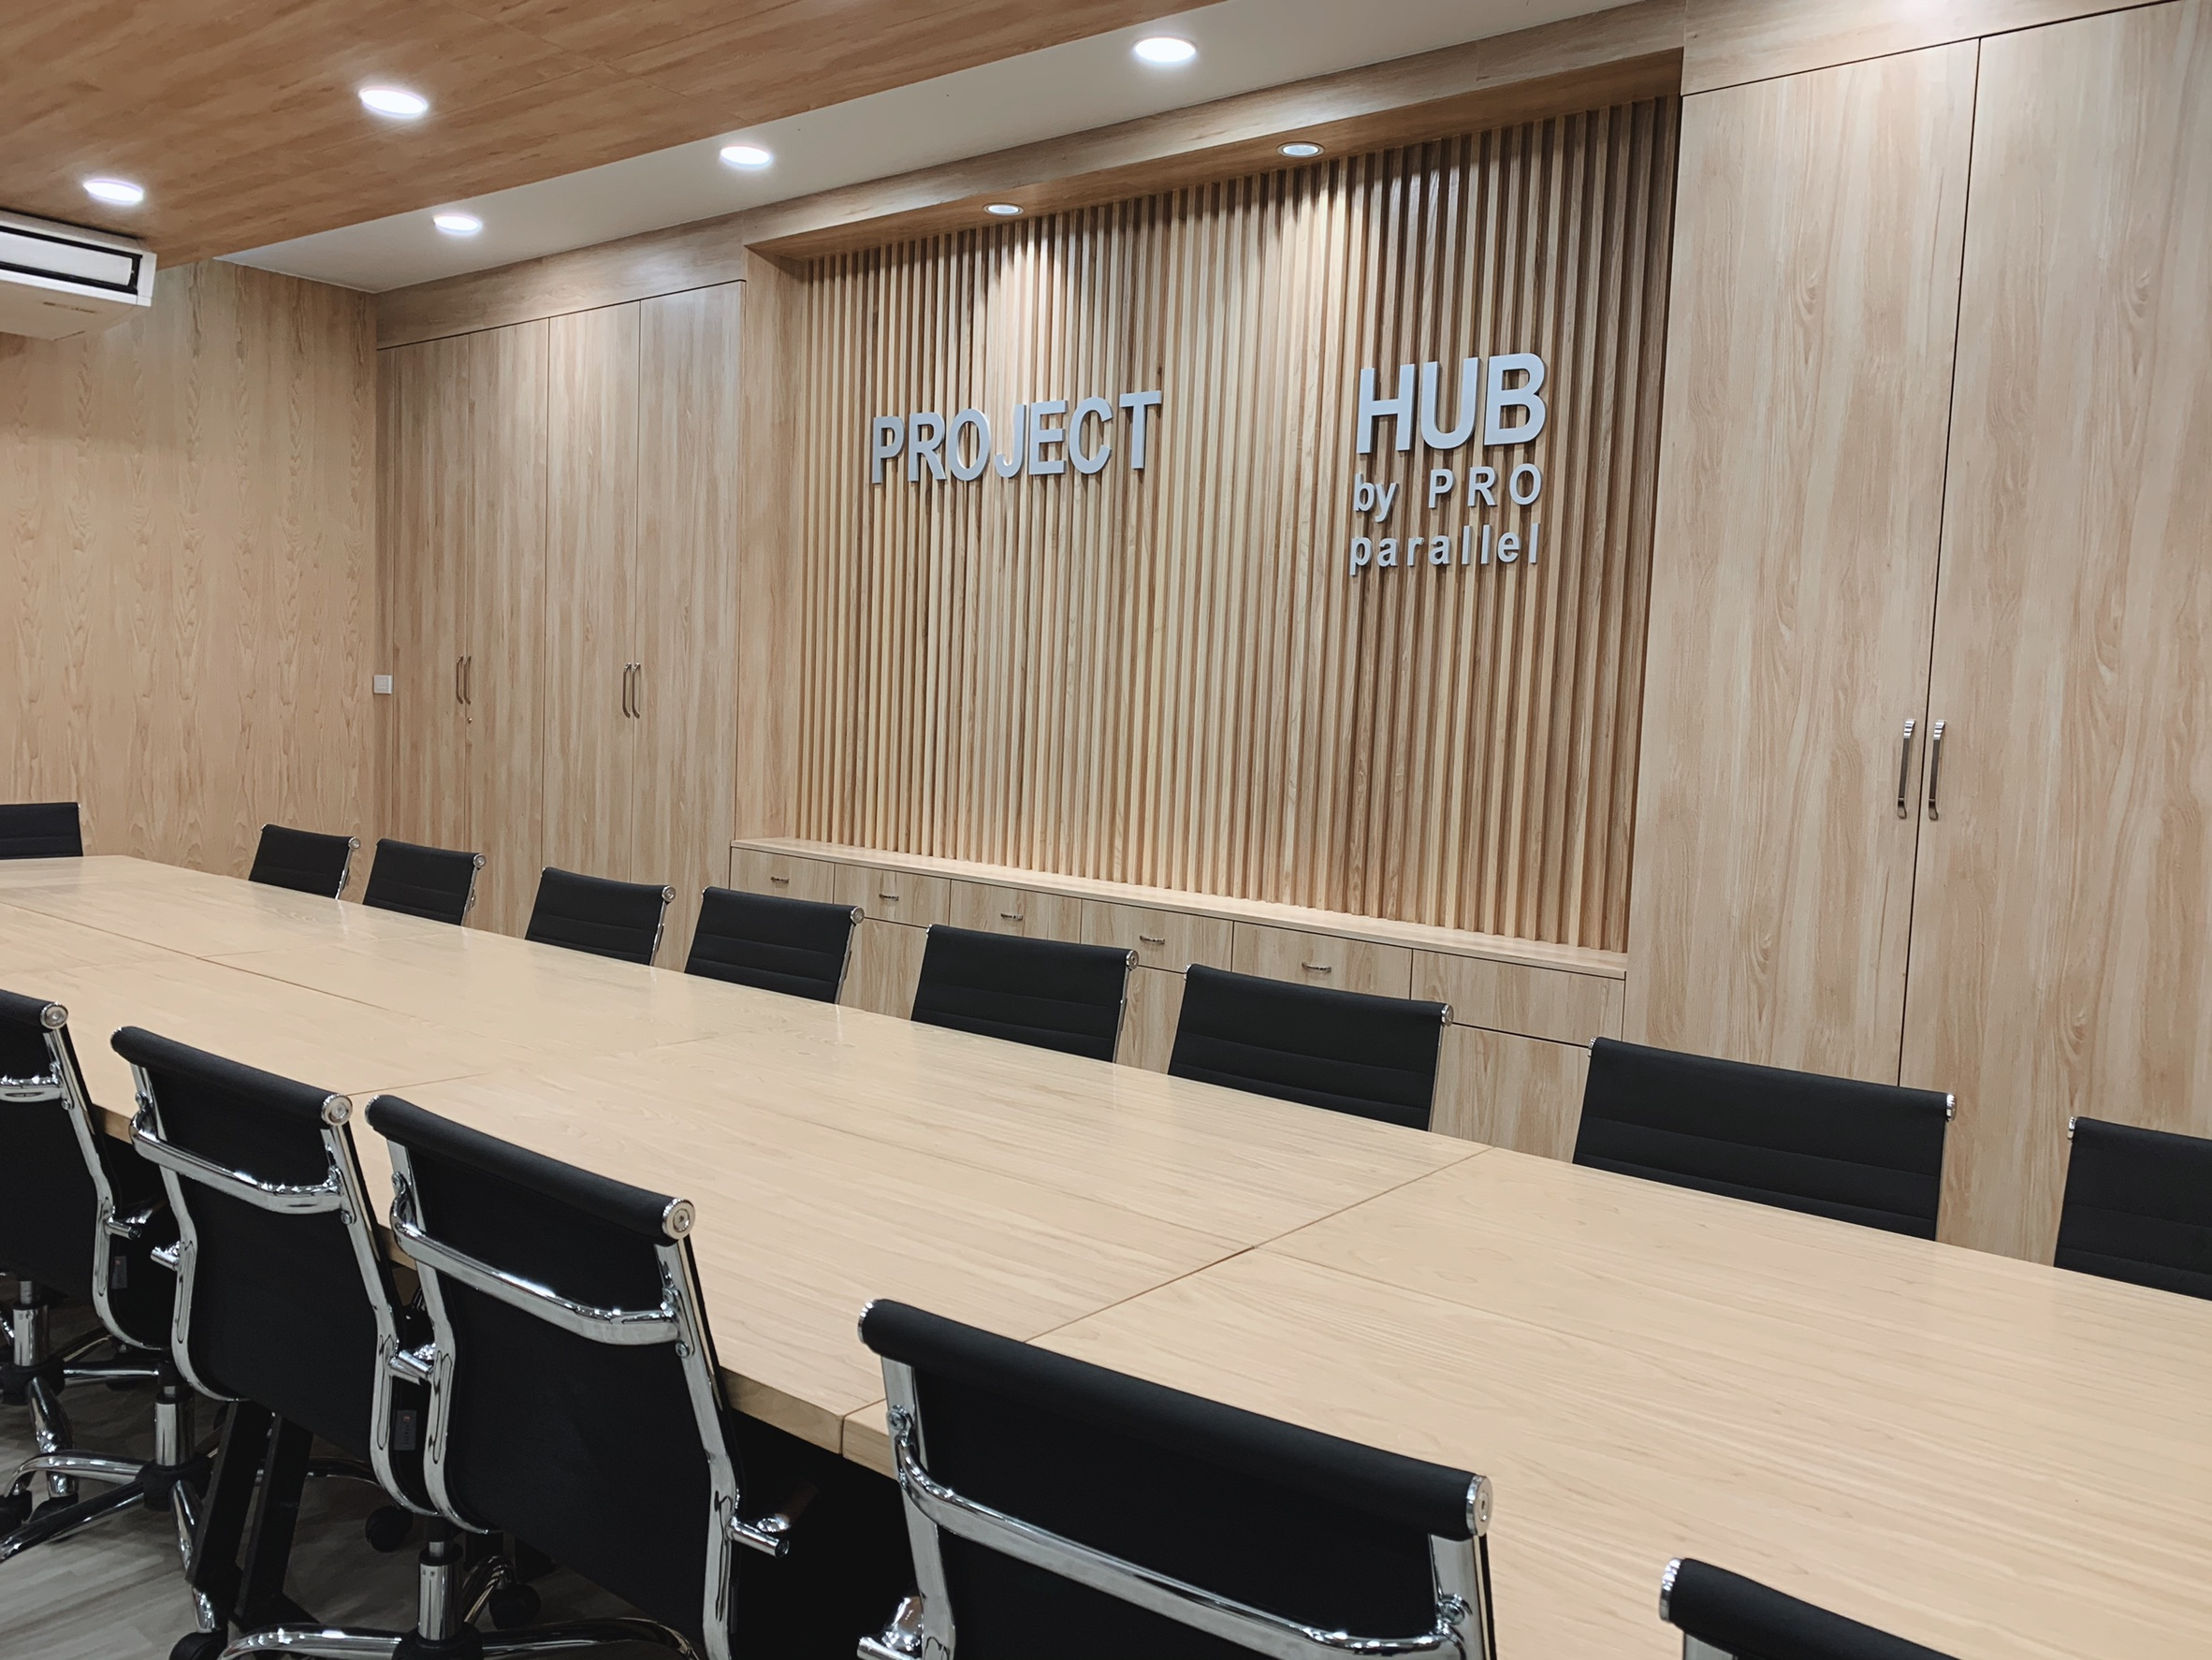 Project Hub, Chiang Rai